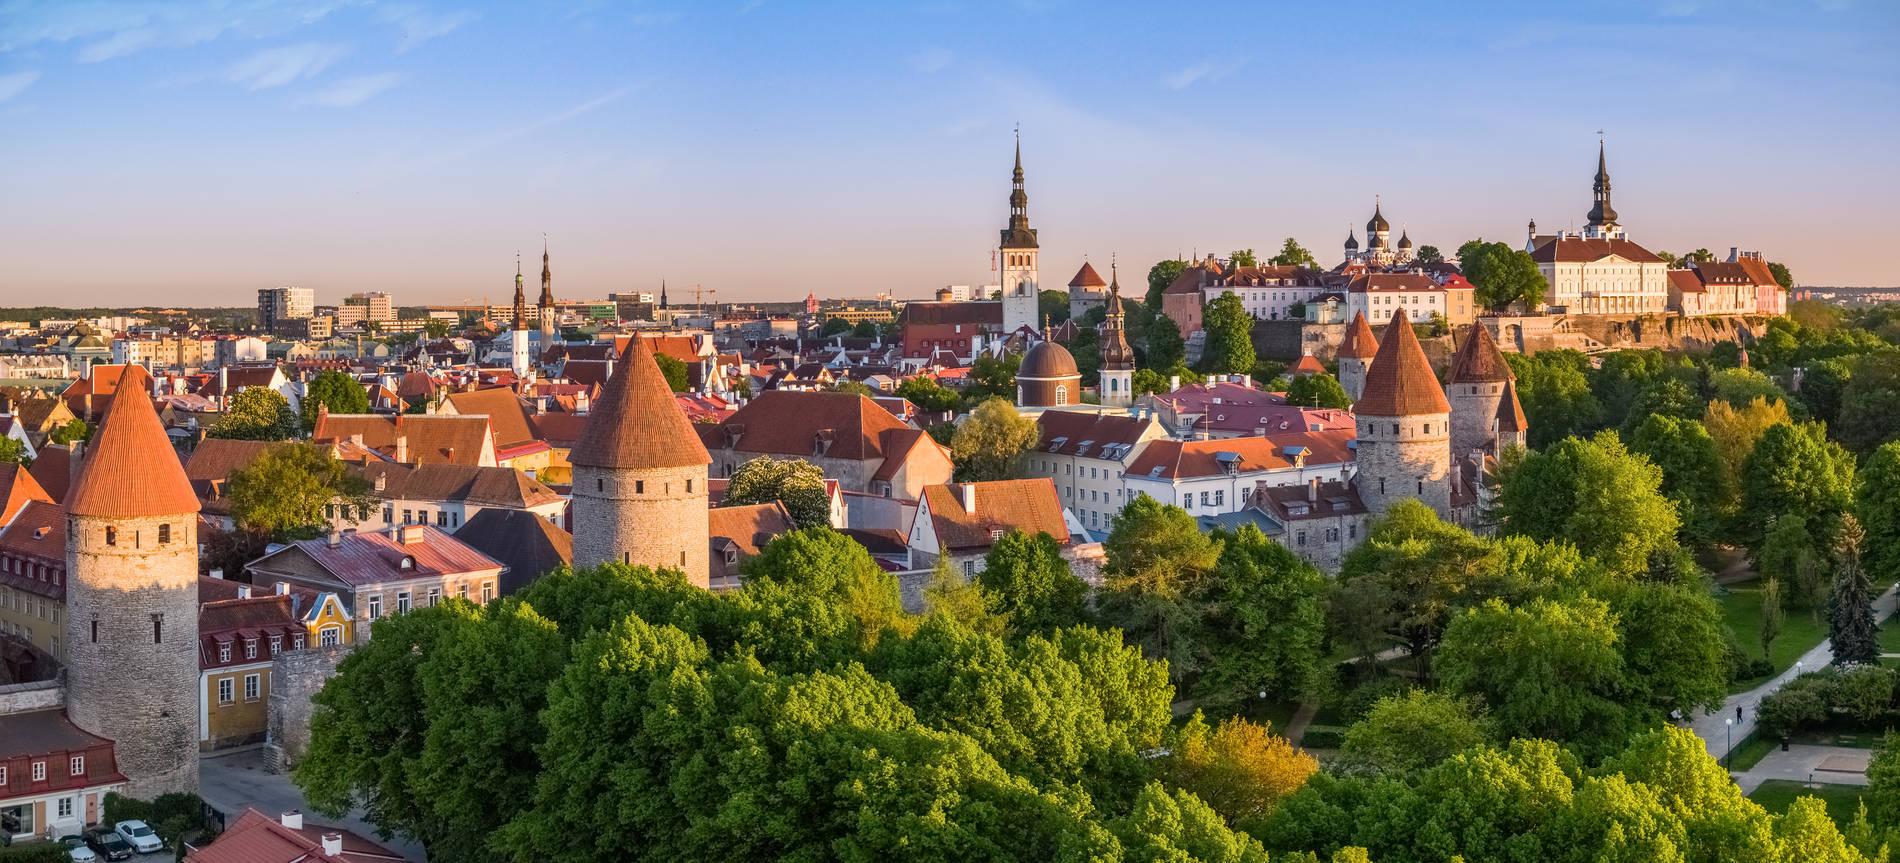 View of the Old Town of Tallinn, Estonia